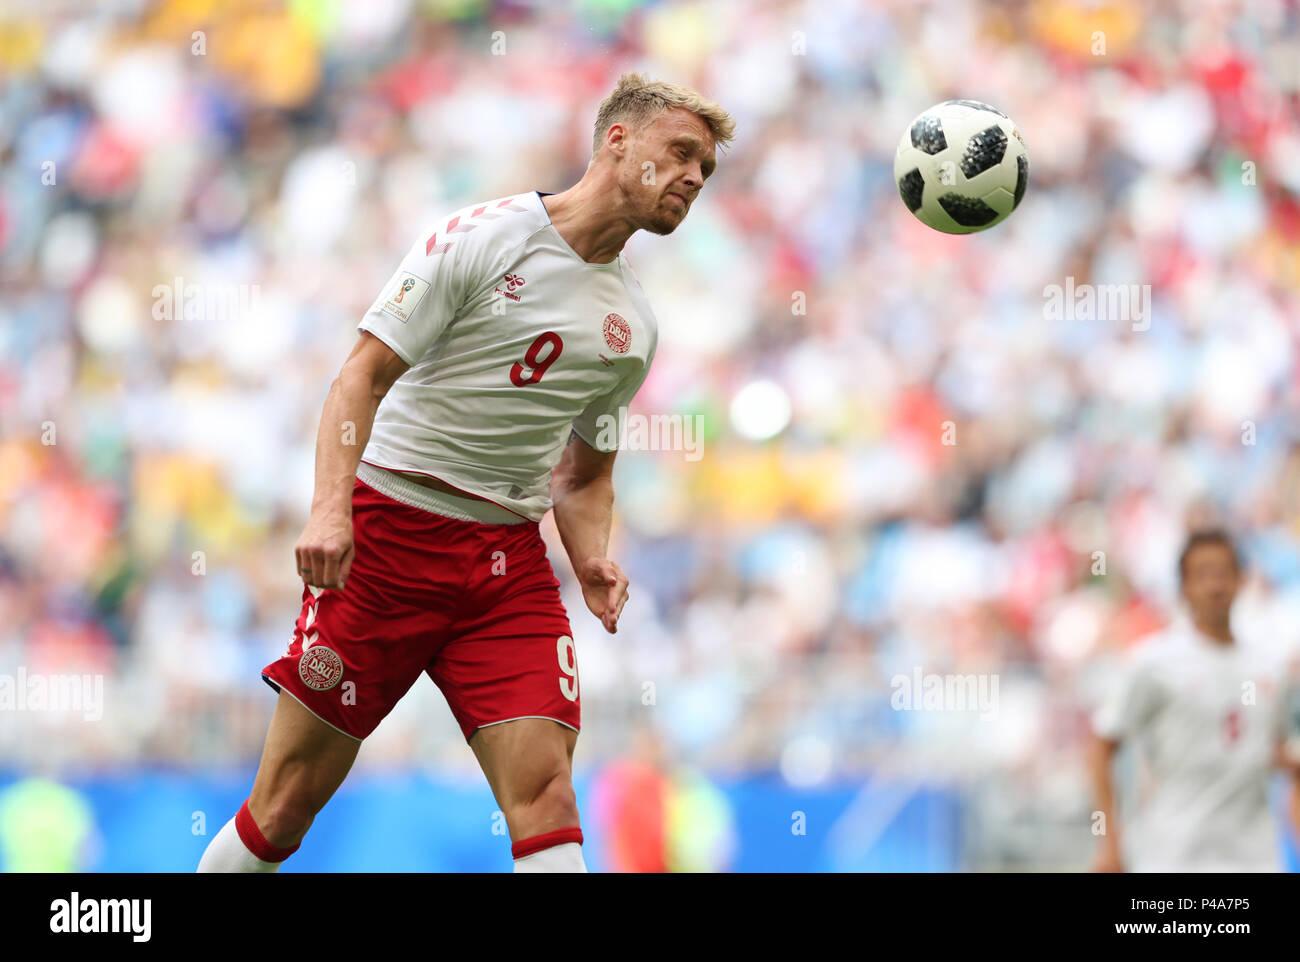 Samara, Russia. 21st June, 2018. Nicolai Jorgensen of Denmark competes during the 2018 FIFA World Cup Group C match between Denmark and Australia in Samara, Russia, June 21, 2018. Credit: Ye Pingfan/Xinhua/Alamy Live News - Stock Image